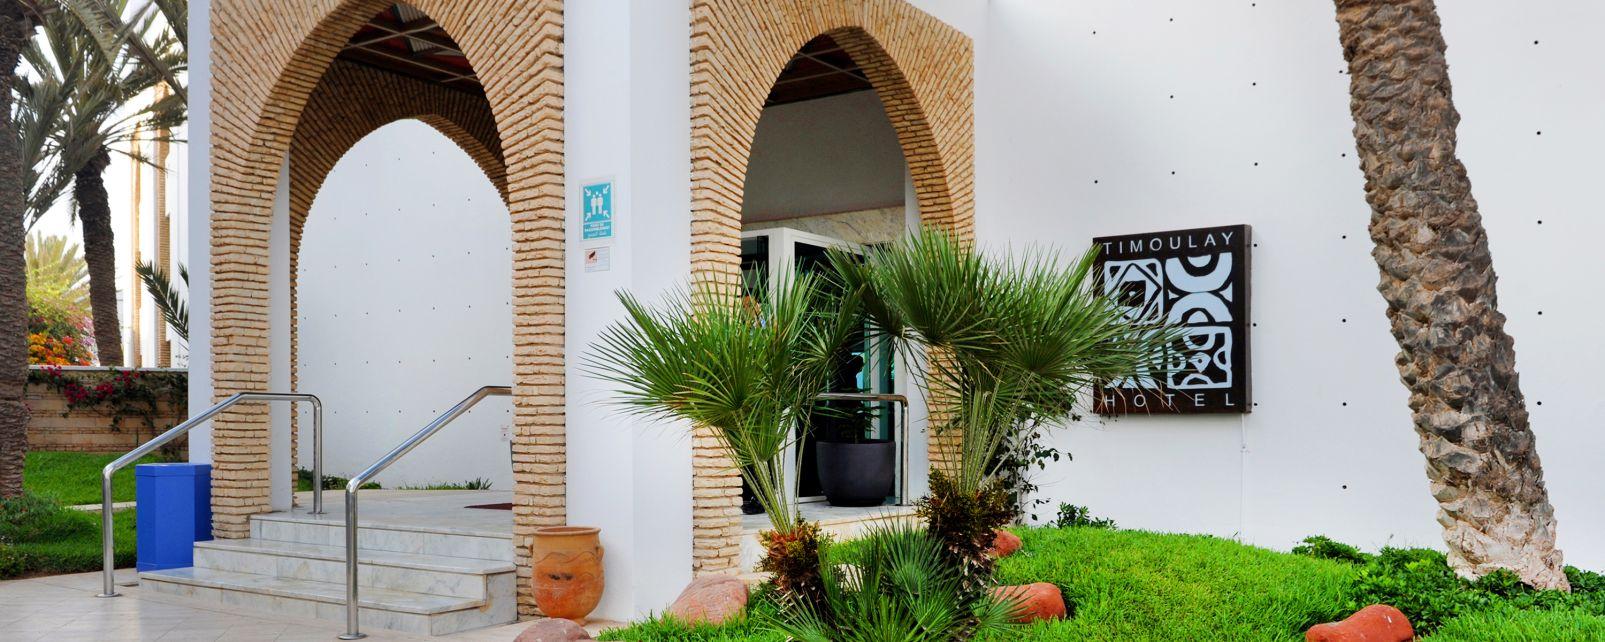 Hôtel Timoulay